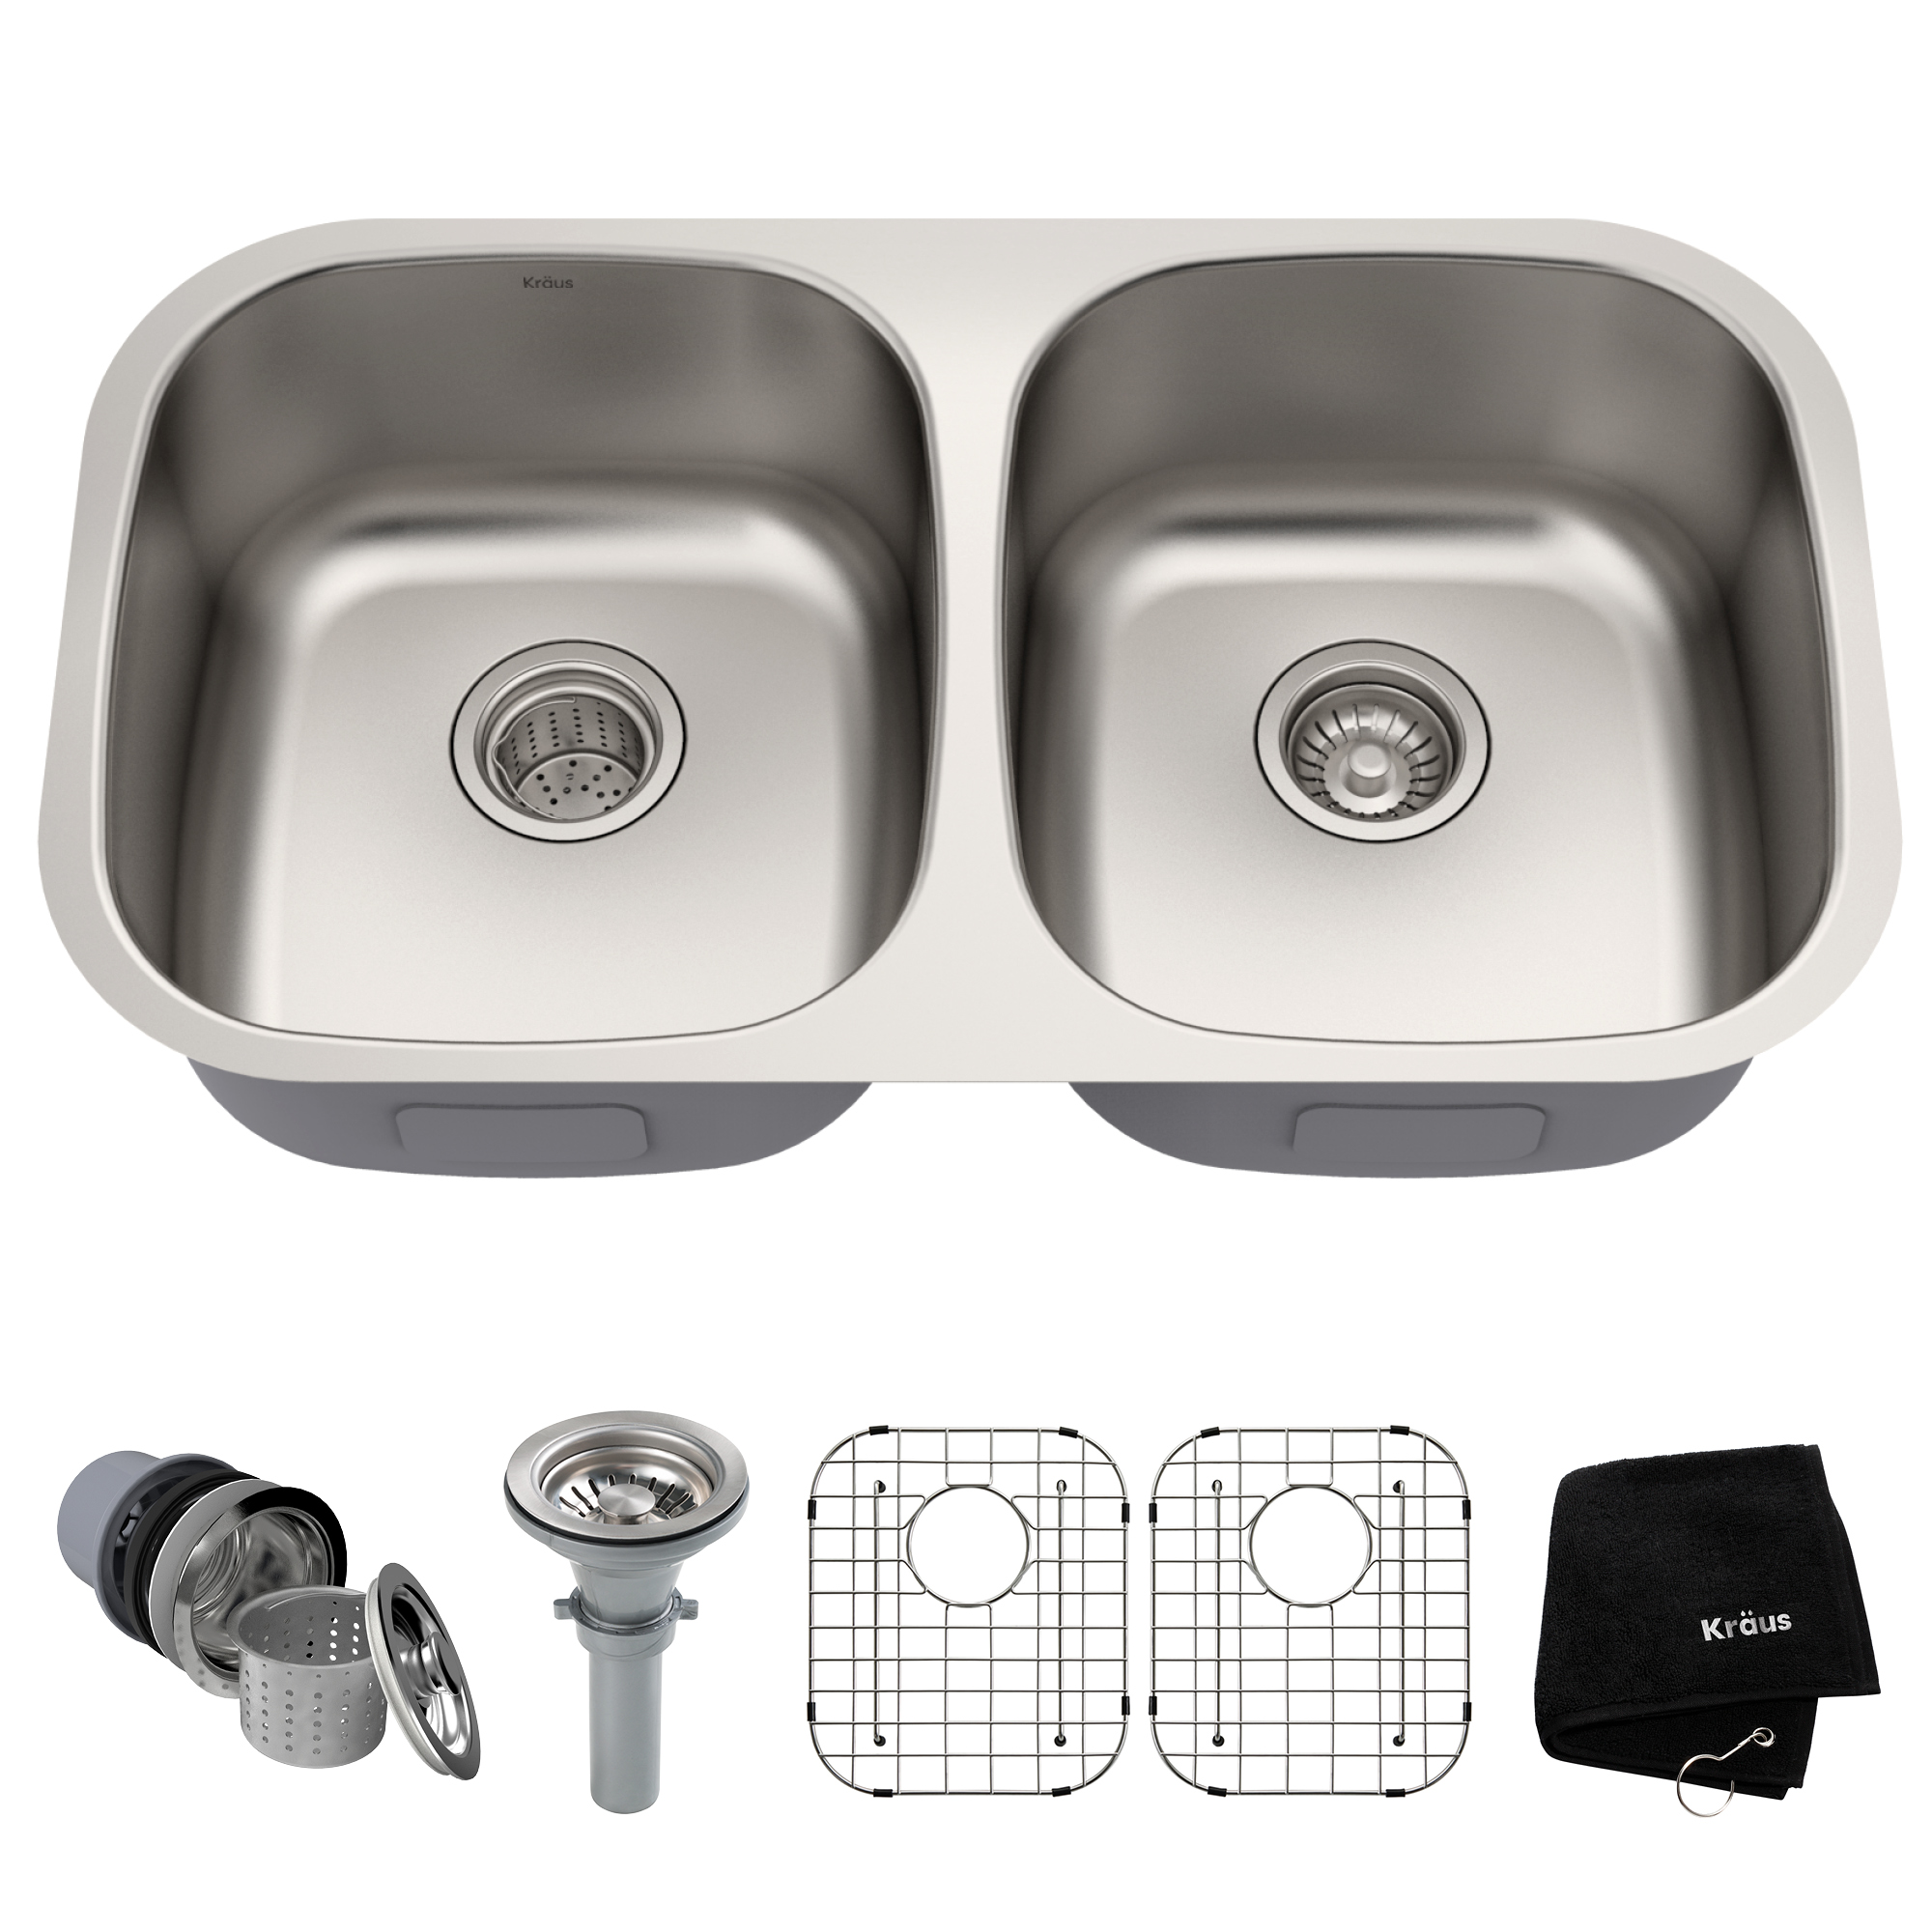 kraus kitchen sinks table sets cheap premier 32 inch 16 gauge undermount 50 double bowl stainless steel sink walmart com